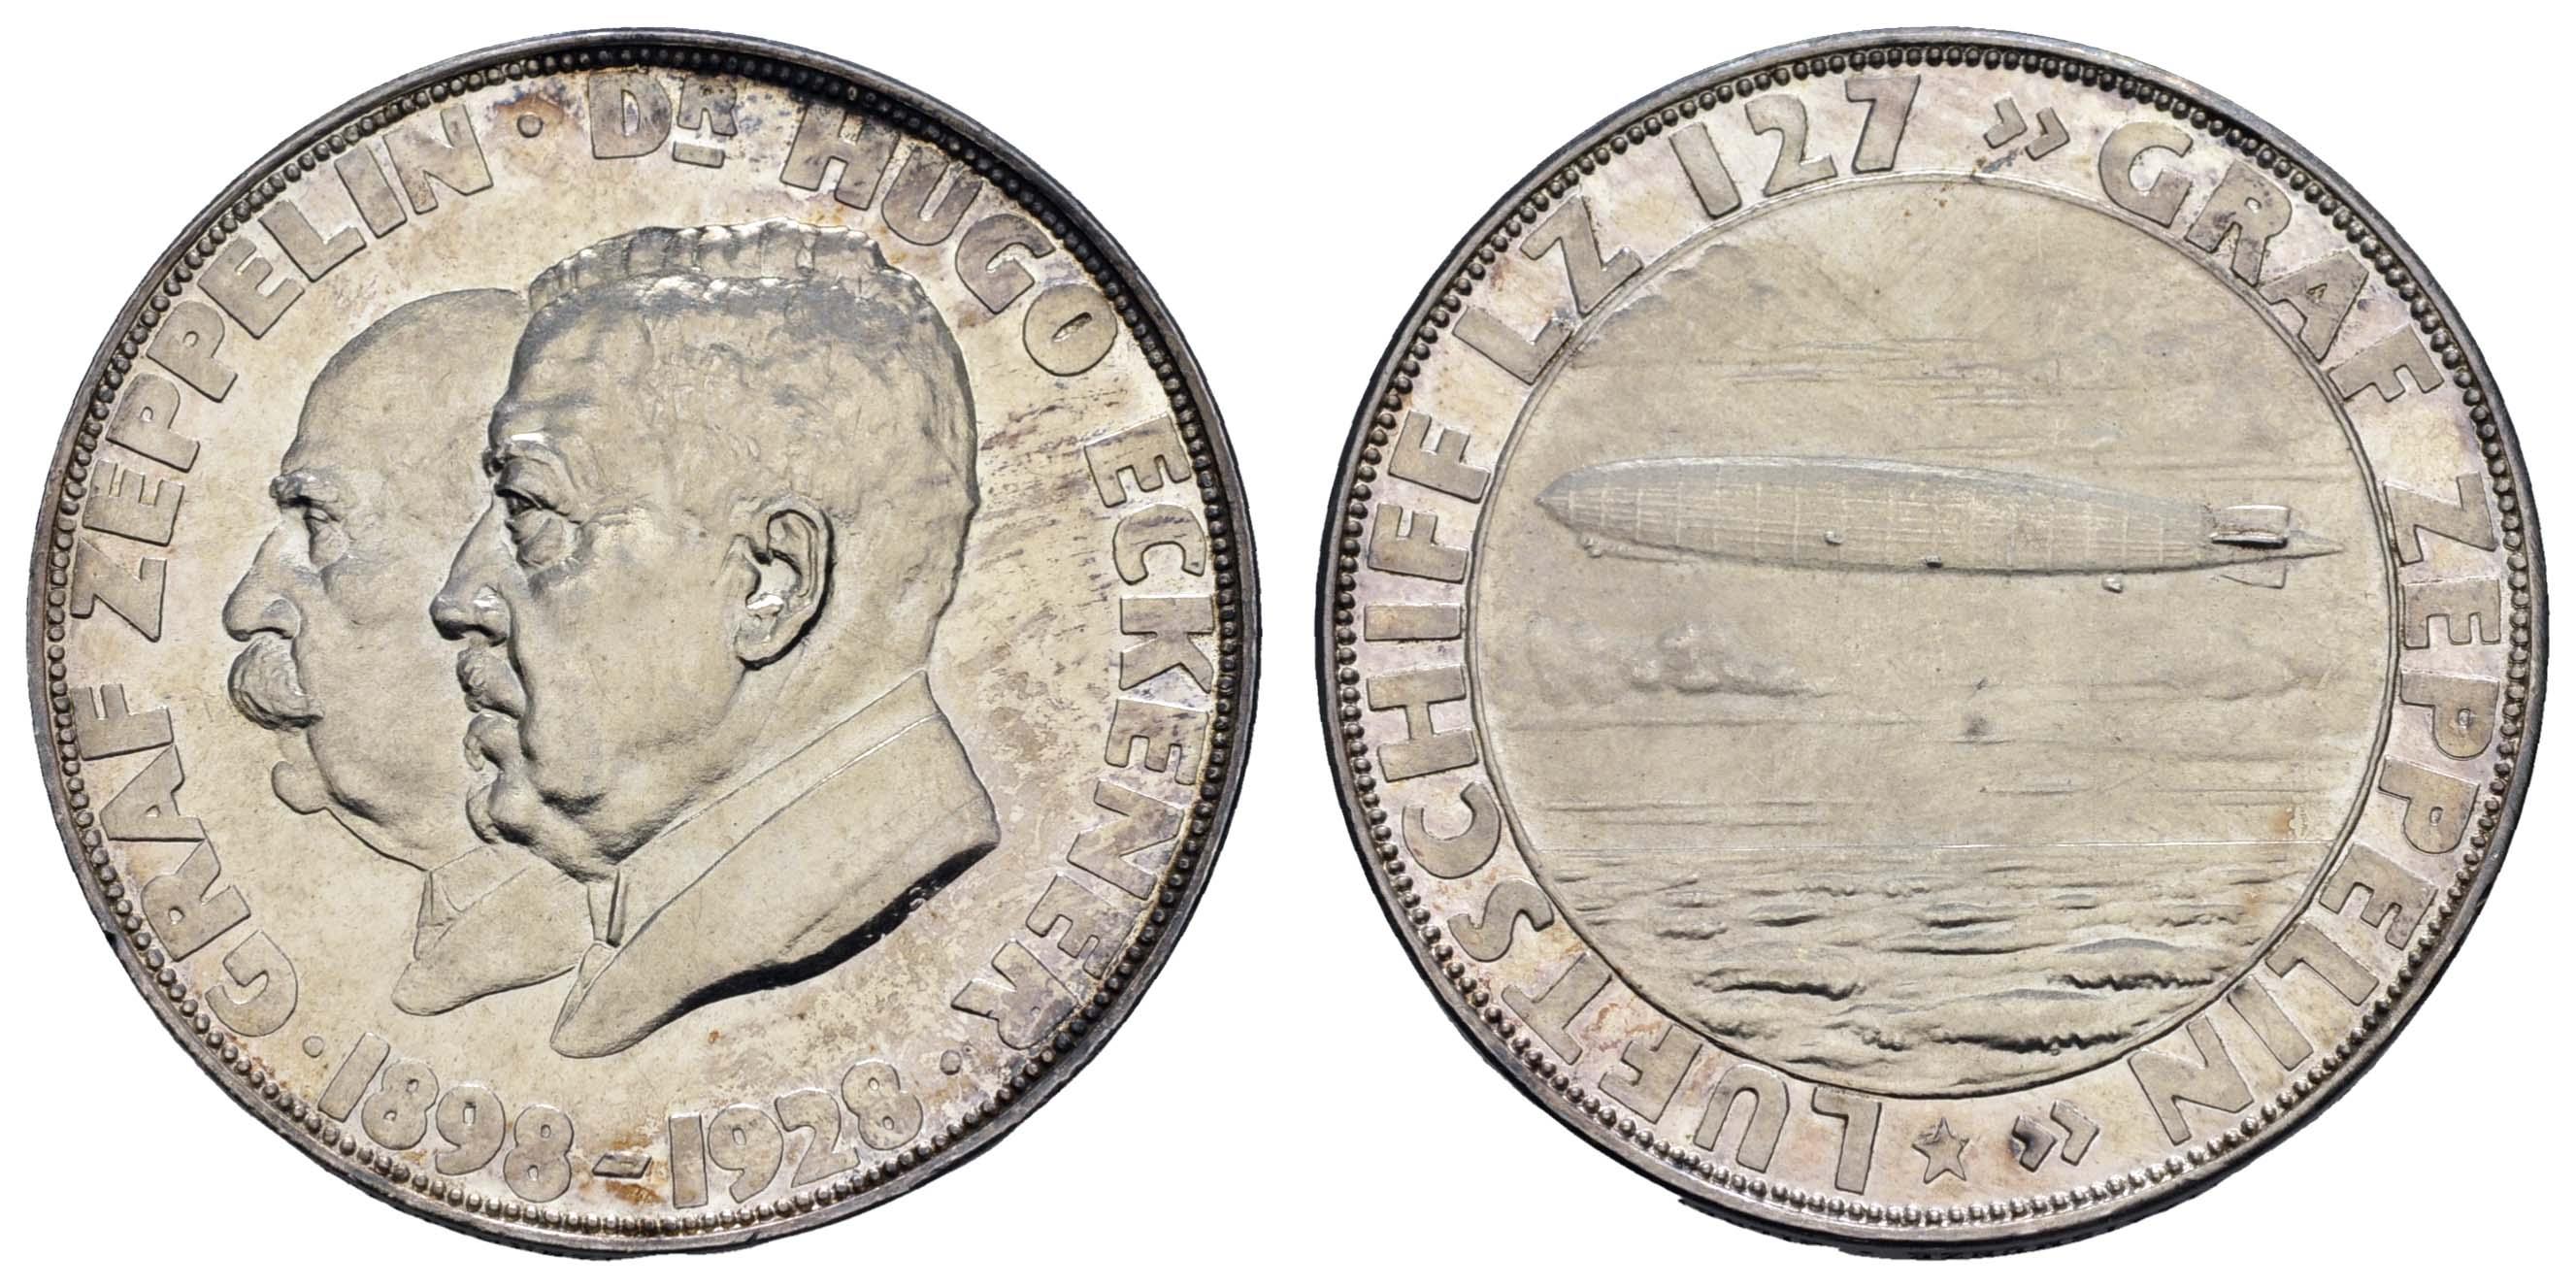 Lot 2327 - medaillen Sonstige Medaillen - Zeppelin -  Auktionshaus Ulrich Felzmann GmbH & Co. KG Coins single lots